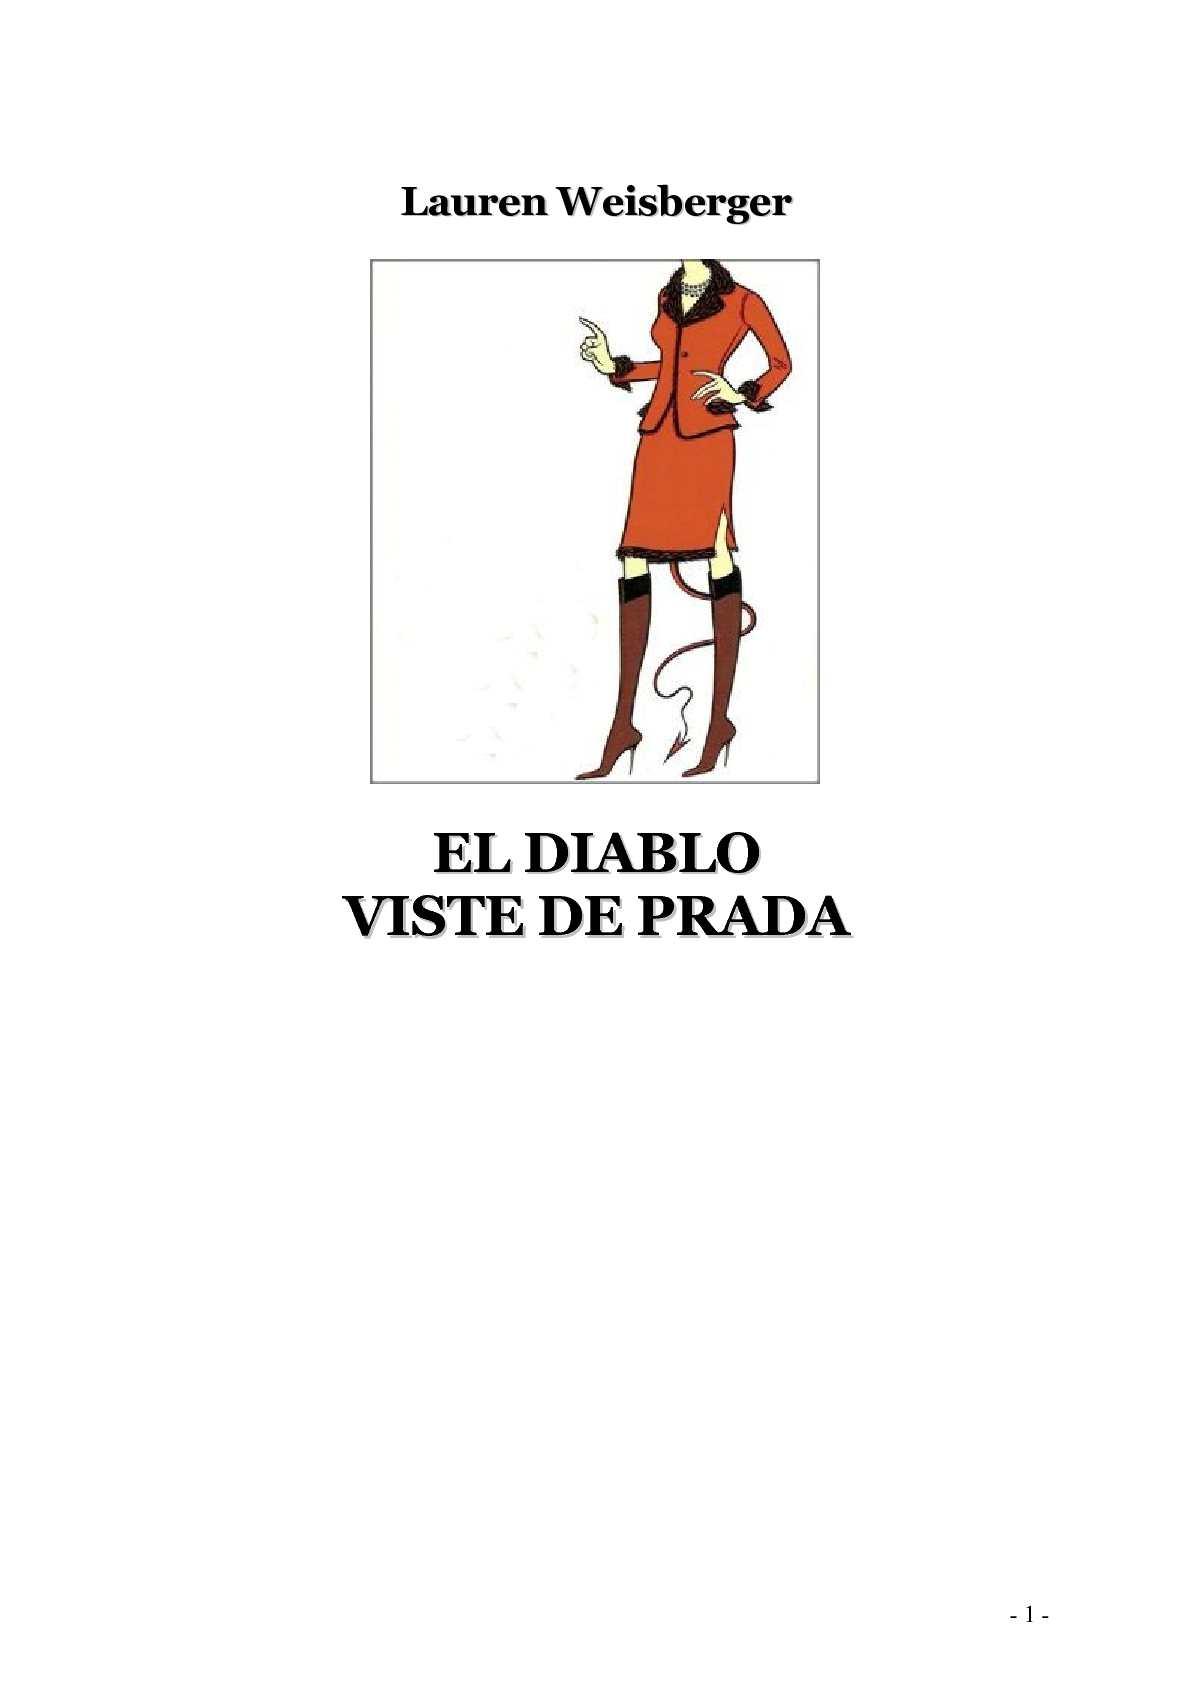 Calaméo - Weisberger - El diablo viste de Prada cab9c6aa632d6